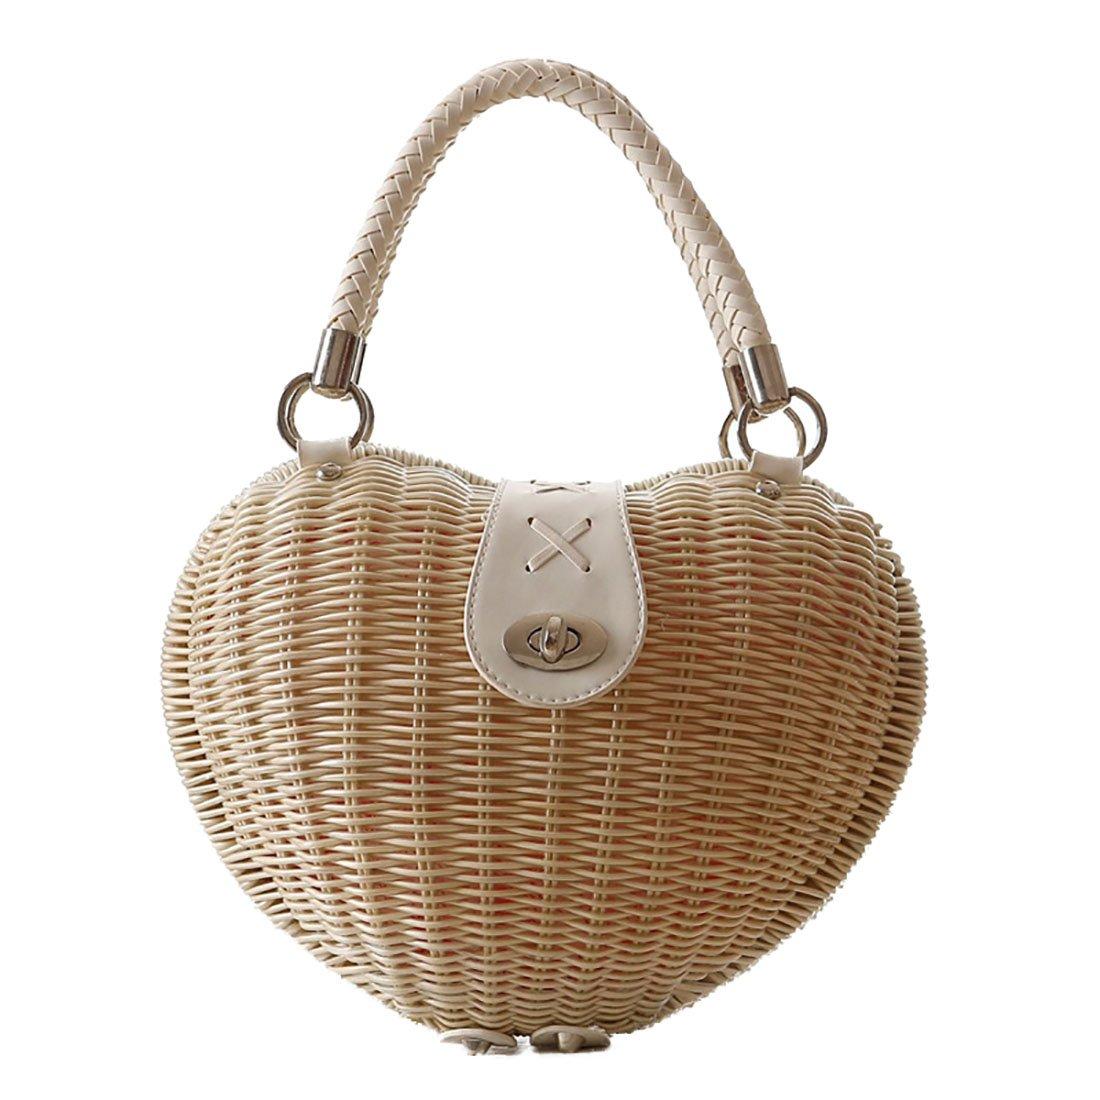 Bamboo bag Handmade Summer Beach bag for Women Mini Handbag Purse (Beige)